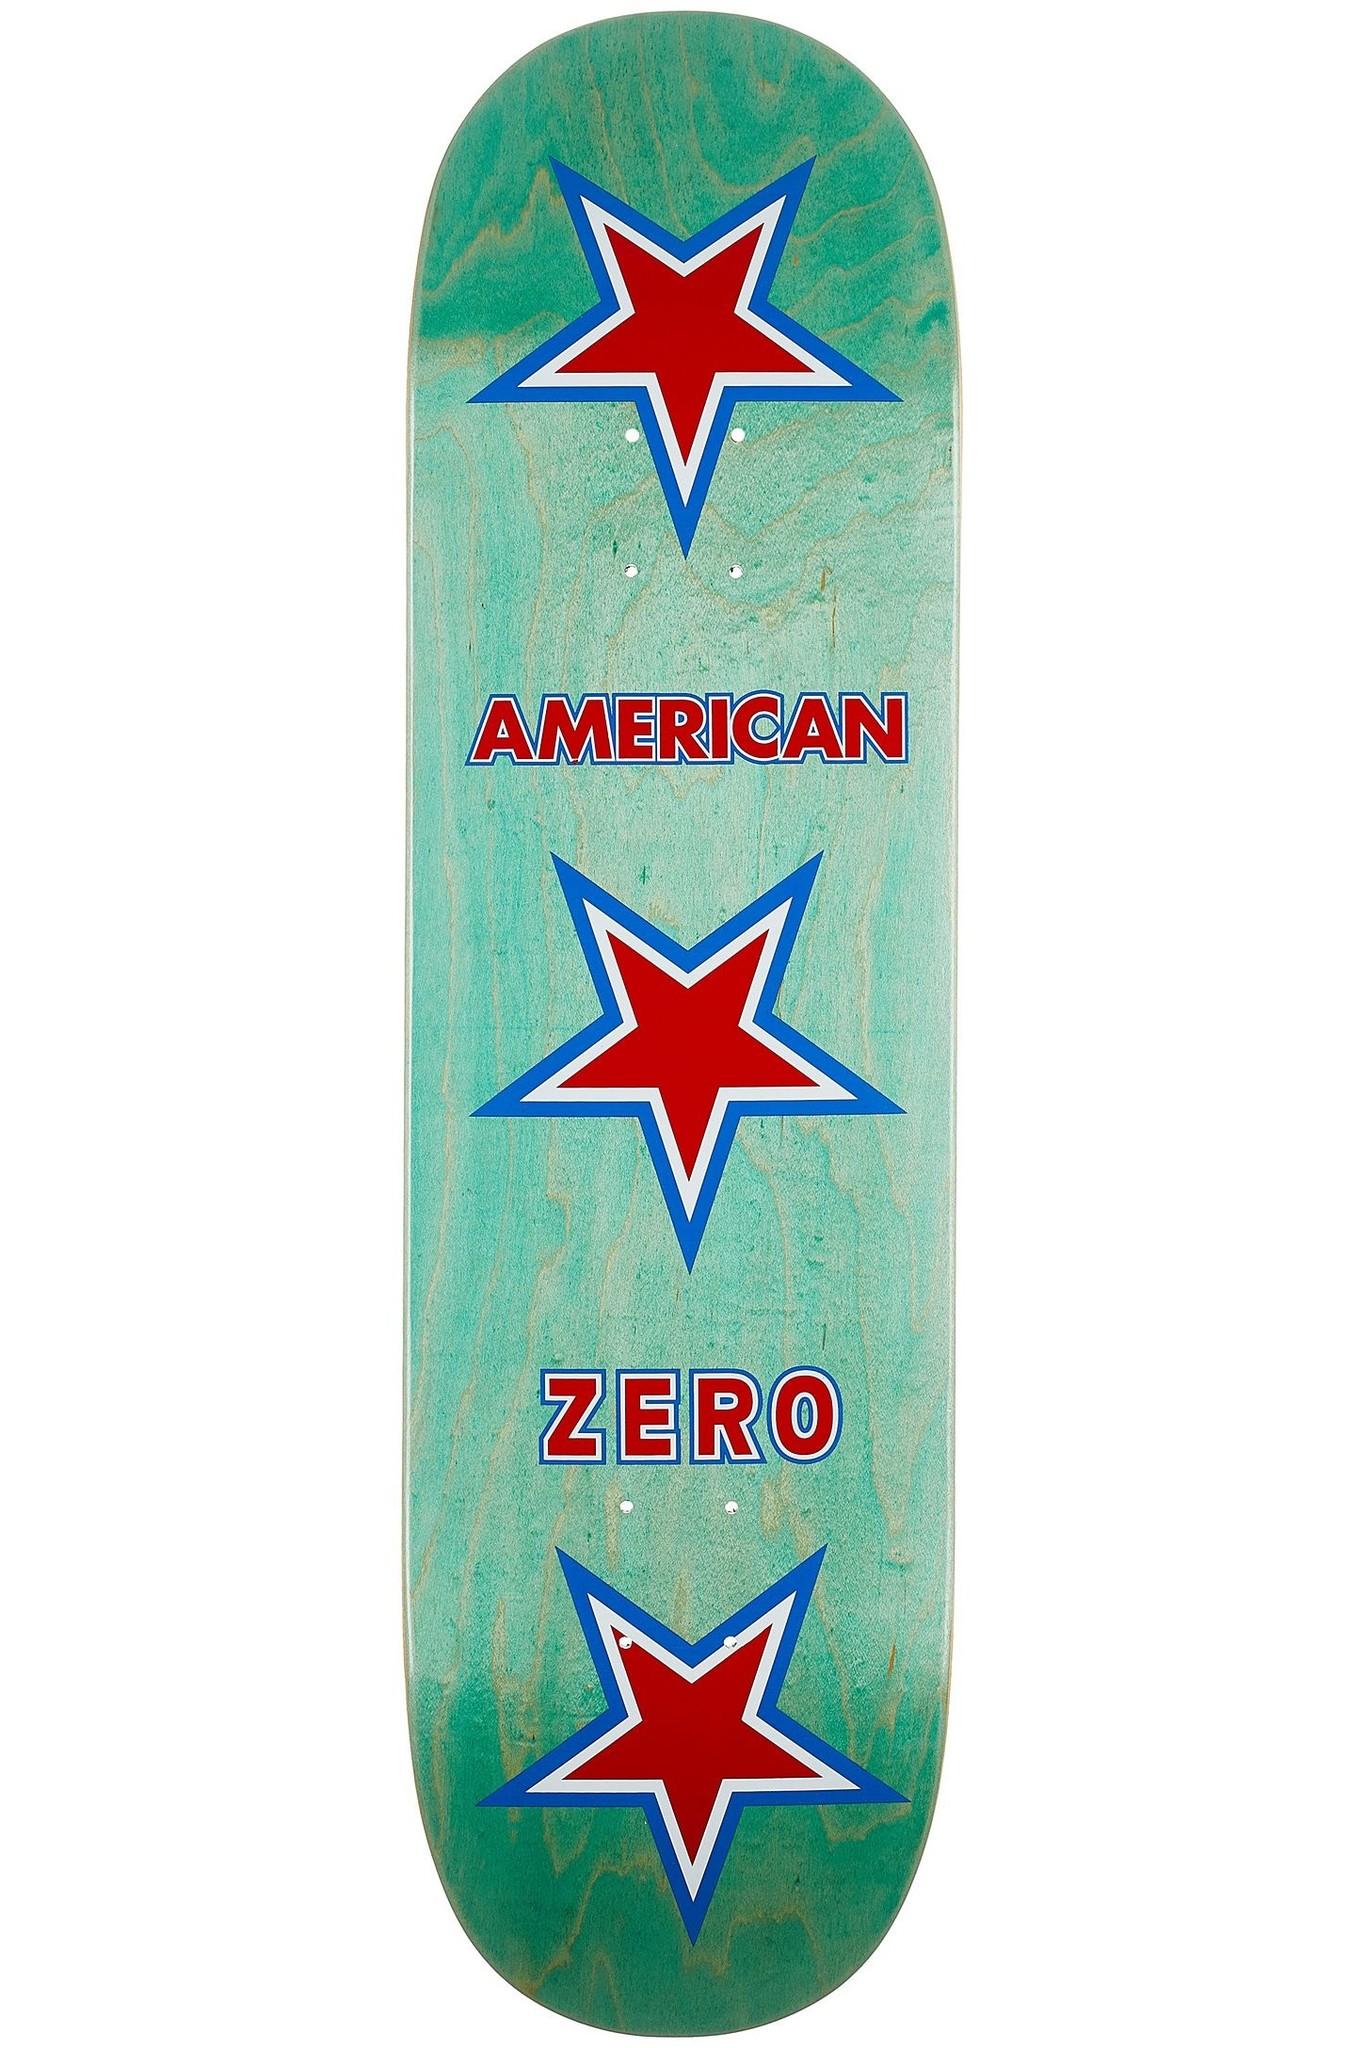 ZERO ZERO AMERICAN ZERO 8.625 (VARIOUS STAINS)